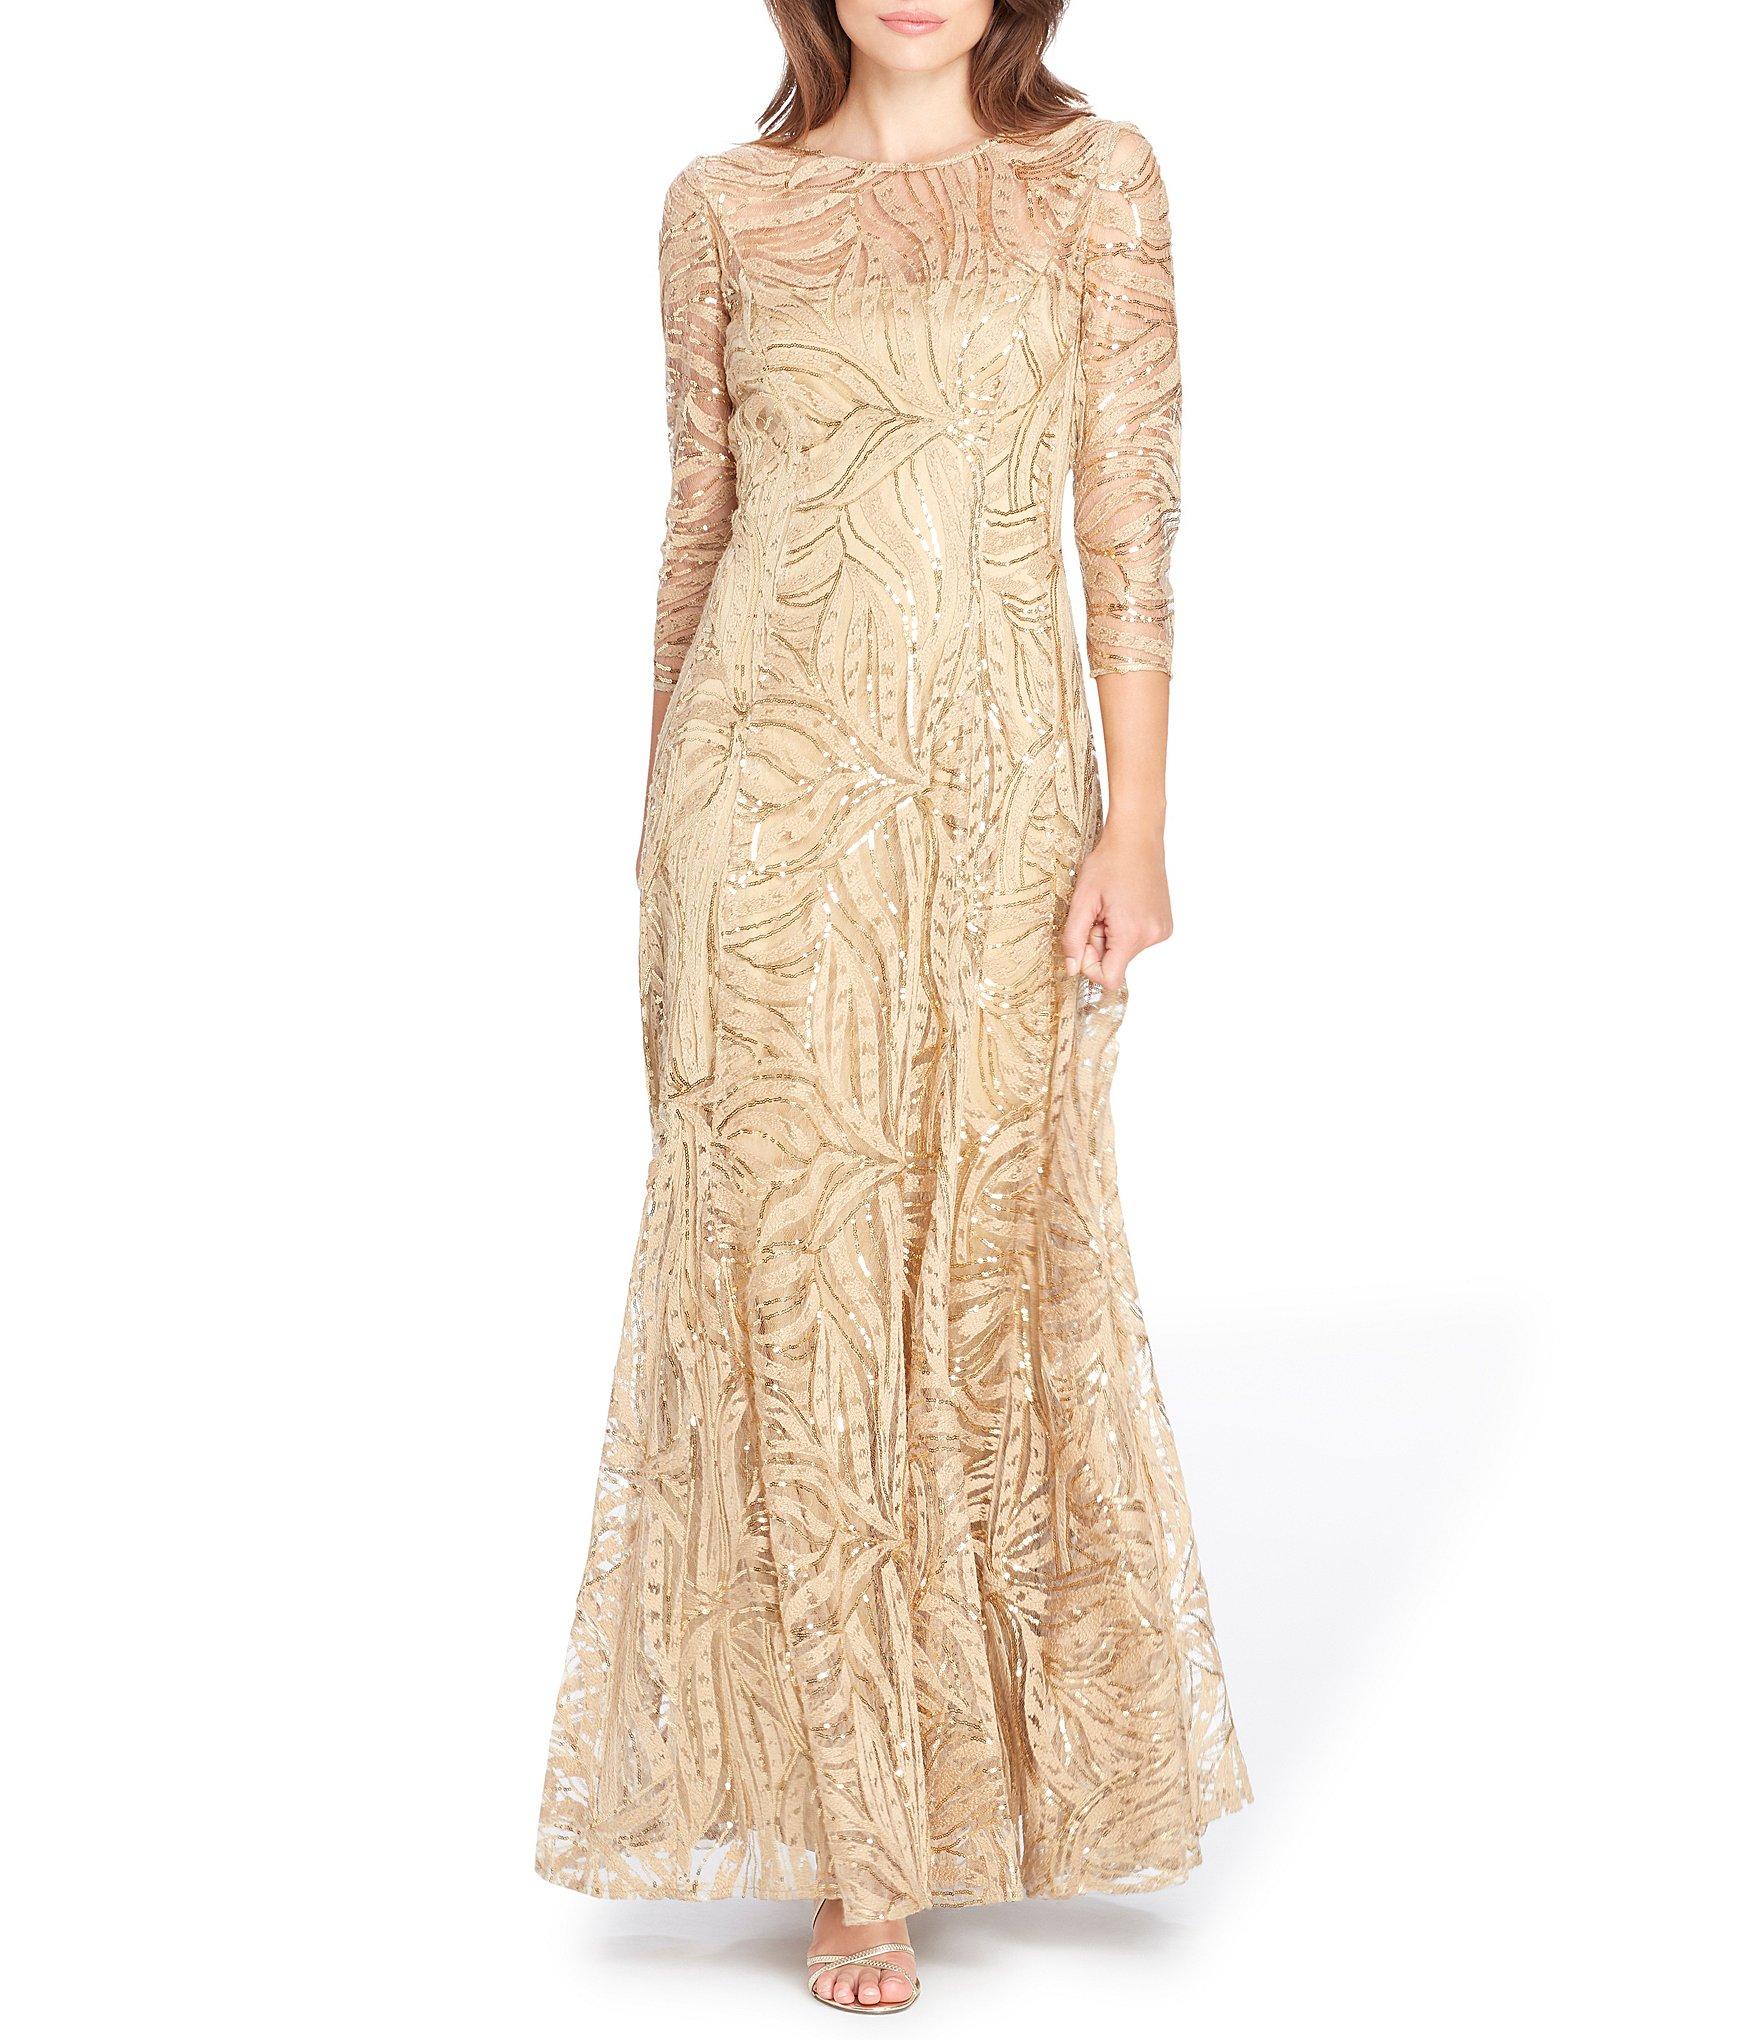 cb234e626de4d Tahari ASL Women's Dresses & Gowns | Dillard's